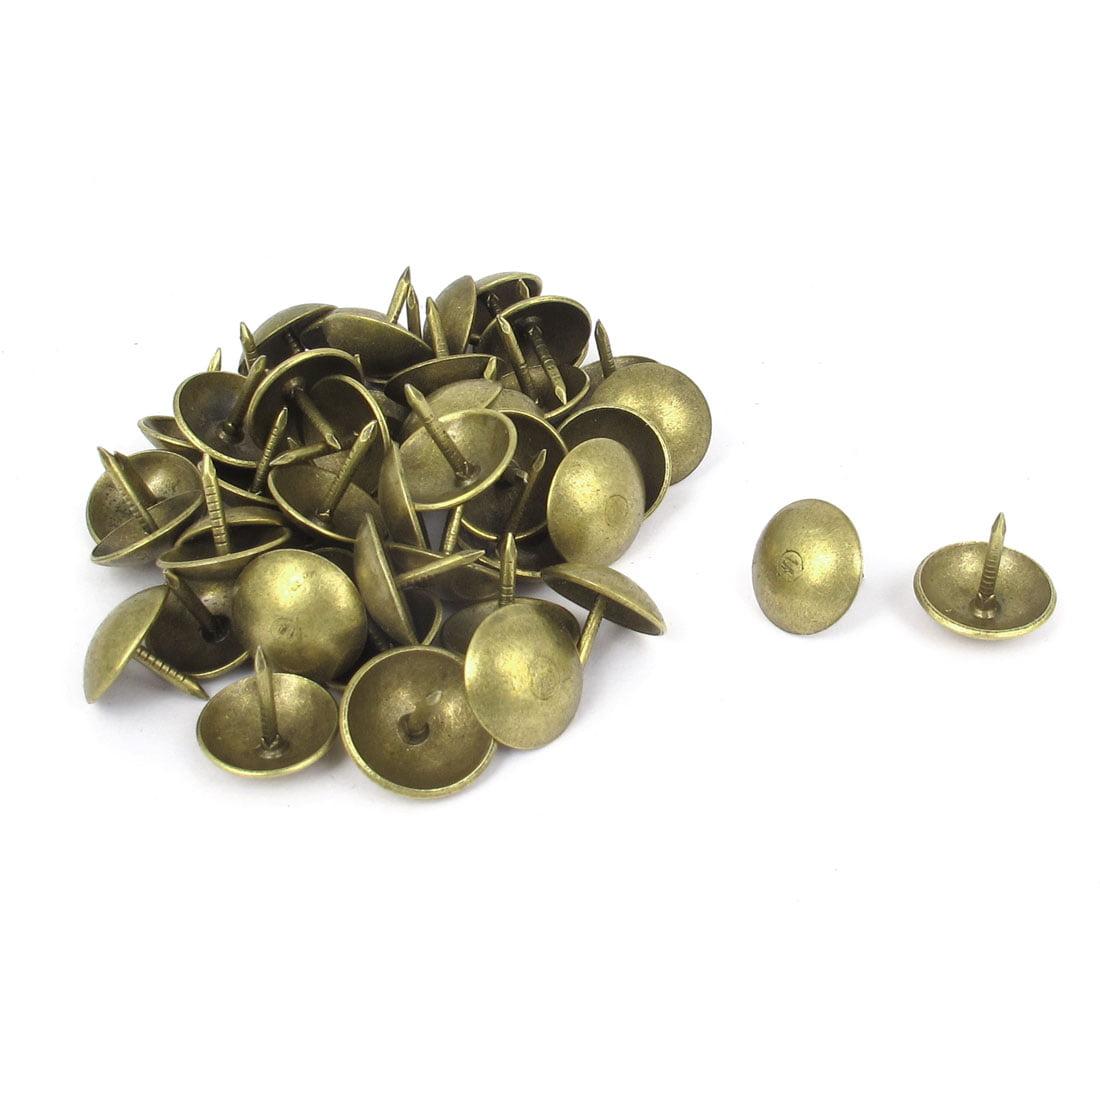 Unique Bargains 14mmx13mm Metal Round Pin Furniture Decorative Domed Nails Bronze Tone 50pcs